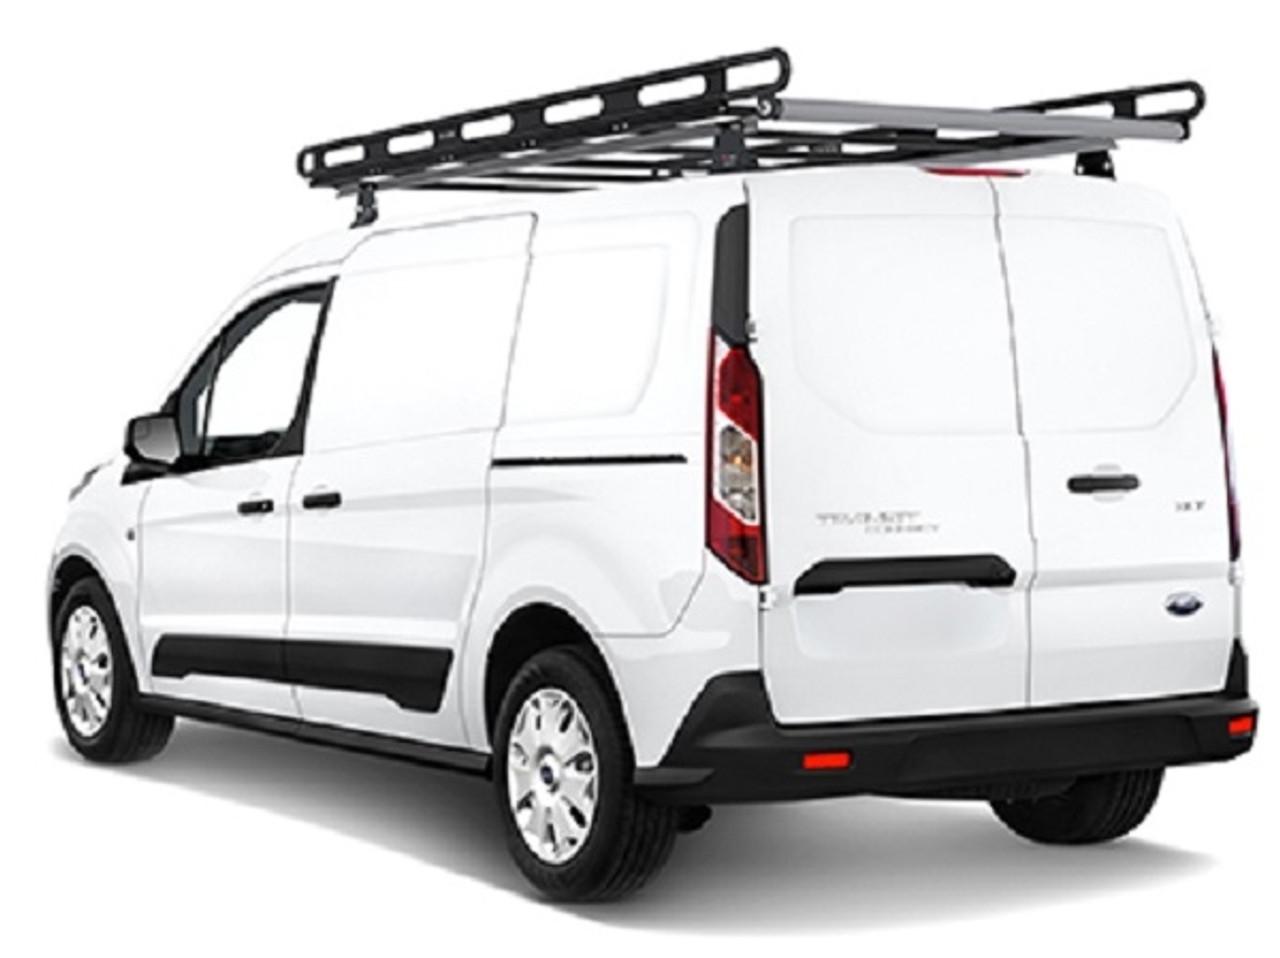 https leonardaccessories com product van ladder racks vantech h2 aluminum roof rack ford transit connect vans